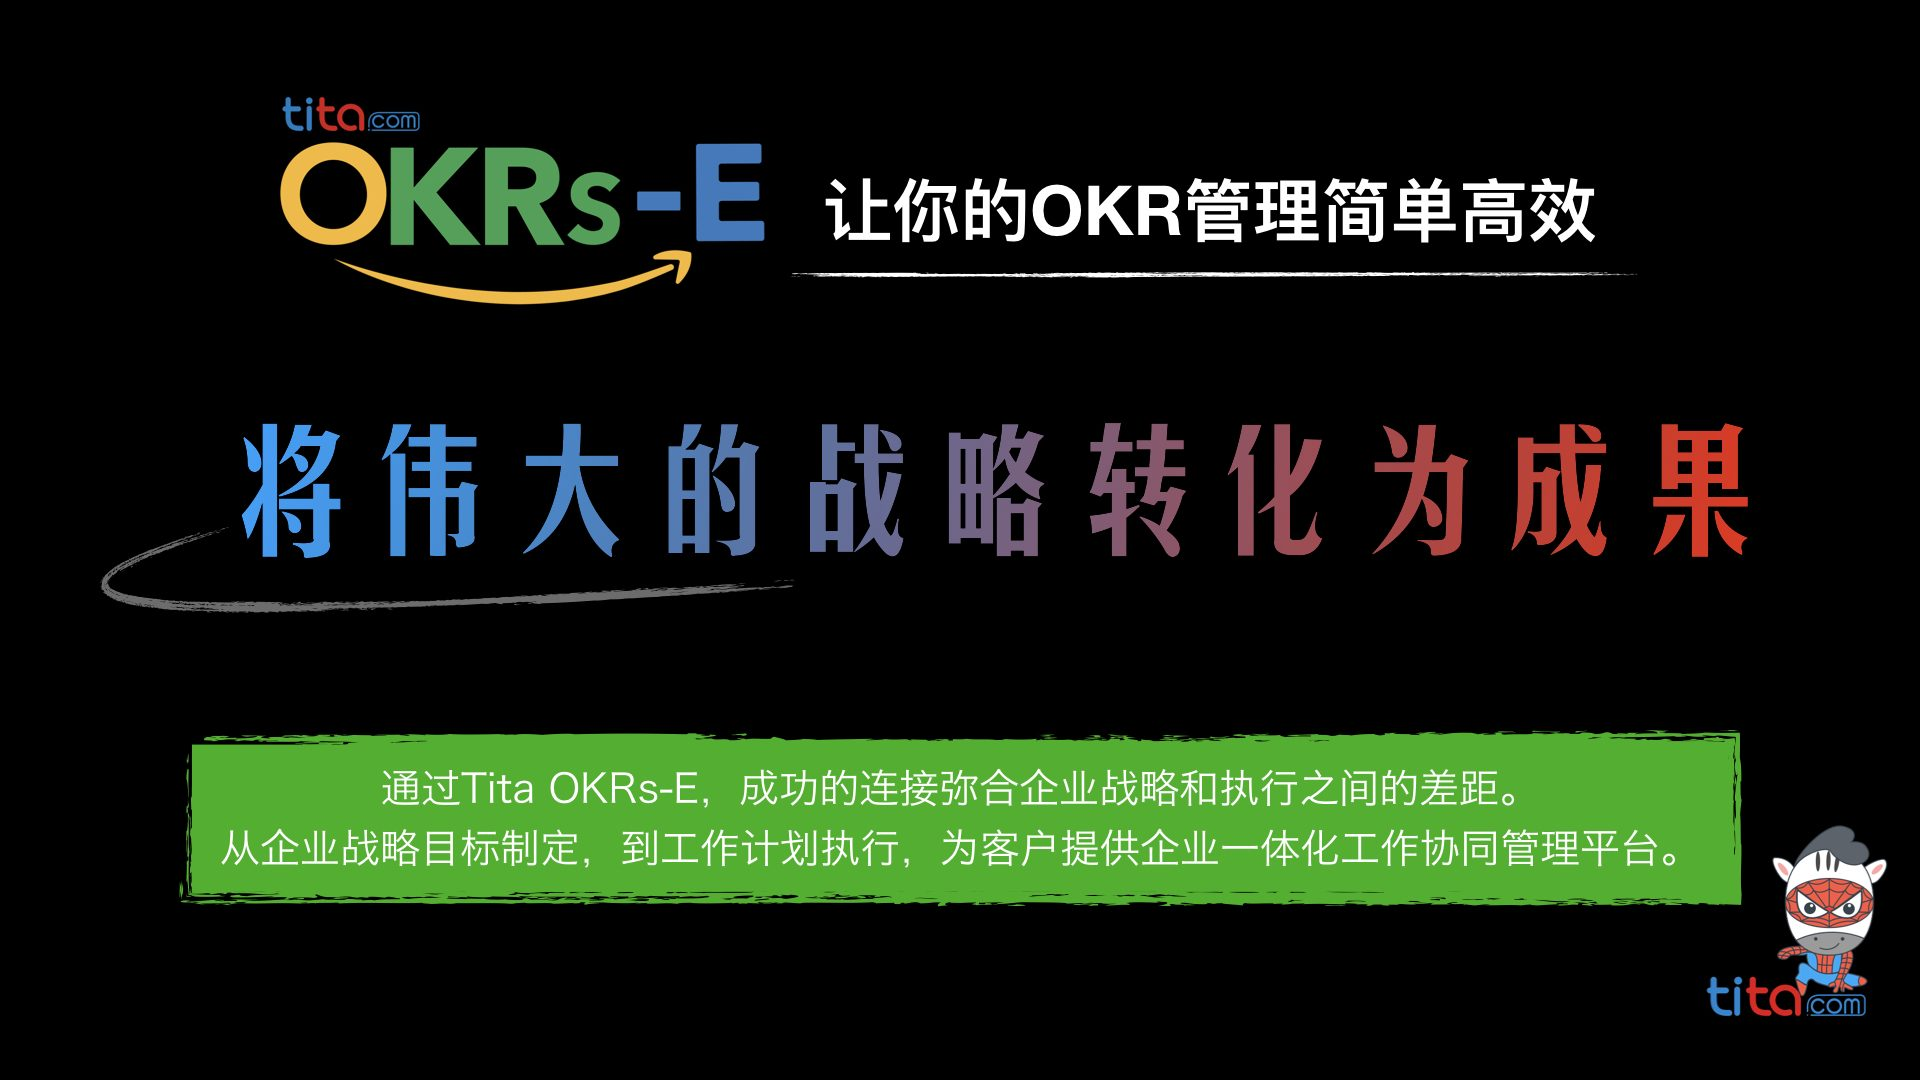 Tita《OKR目标执行管理》产品介绍 OKRs-E@2020